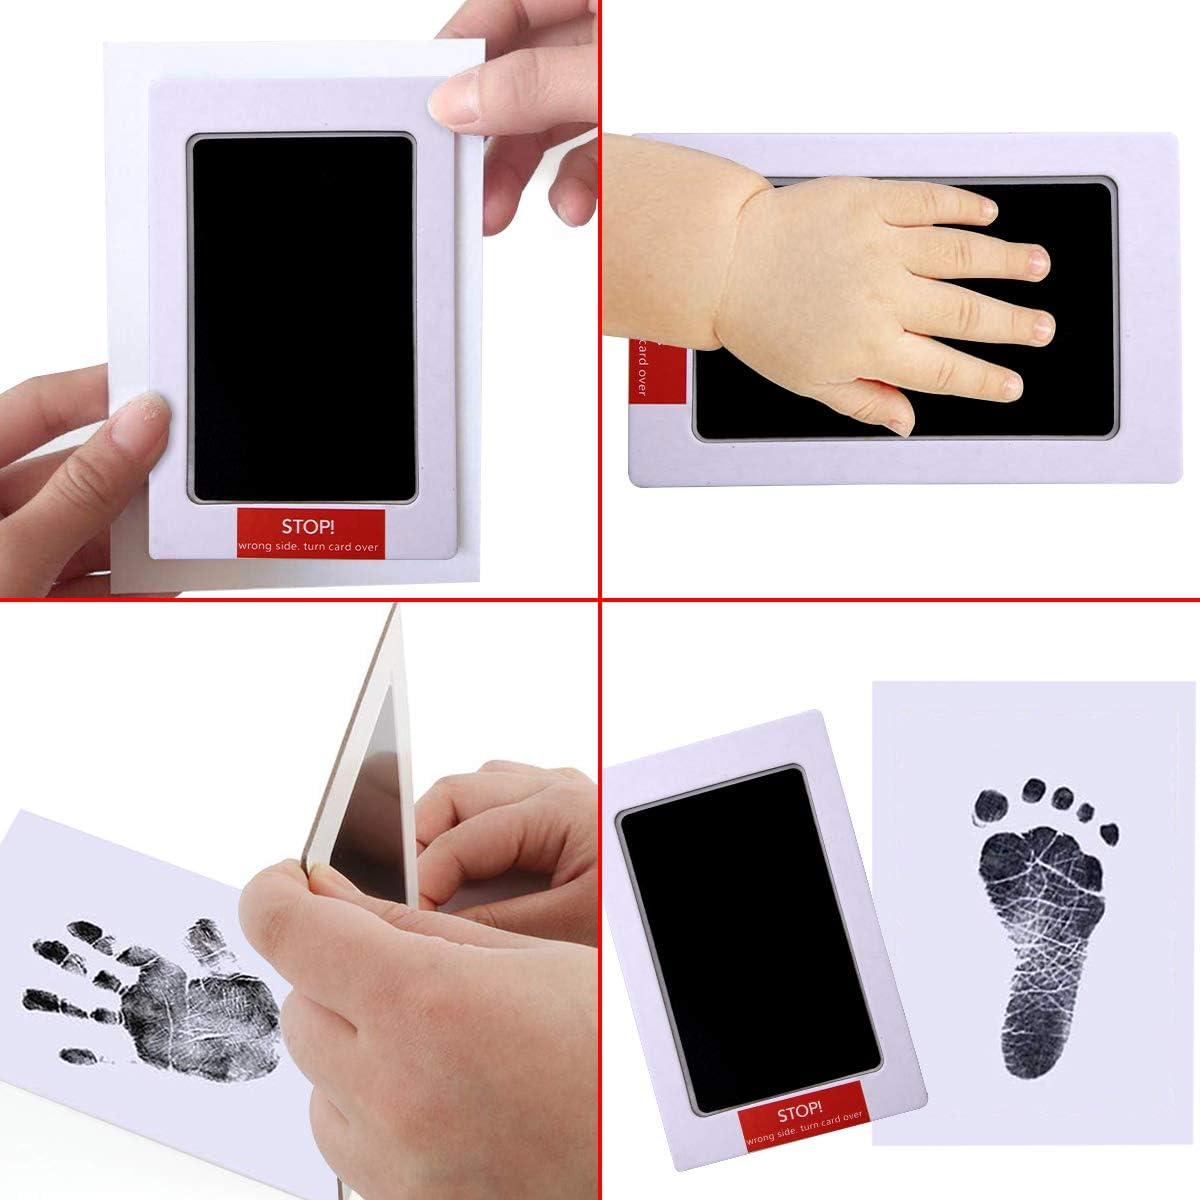 Xiangmall Kit Impronte Bimbi Clean Touch Ink Pad with Imprint Cards Cornici Carta Foto Clip di Legno Corda Canapa per Family Regalo Ricordo Baby Shower and Registry nero